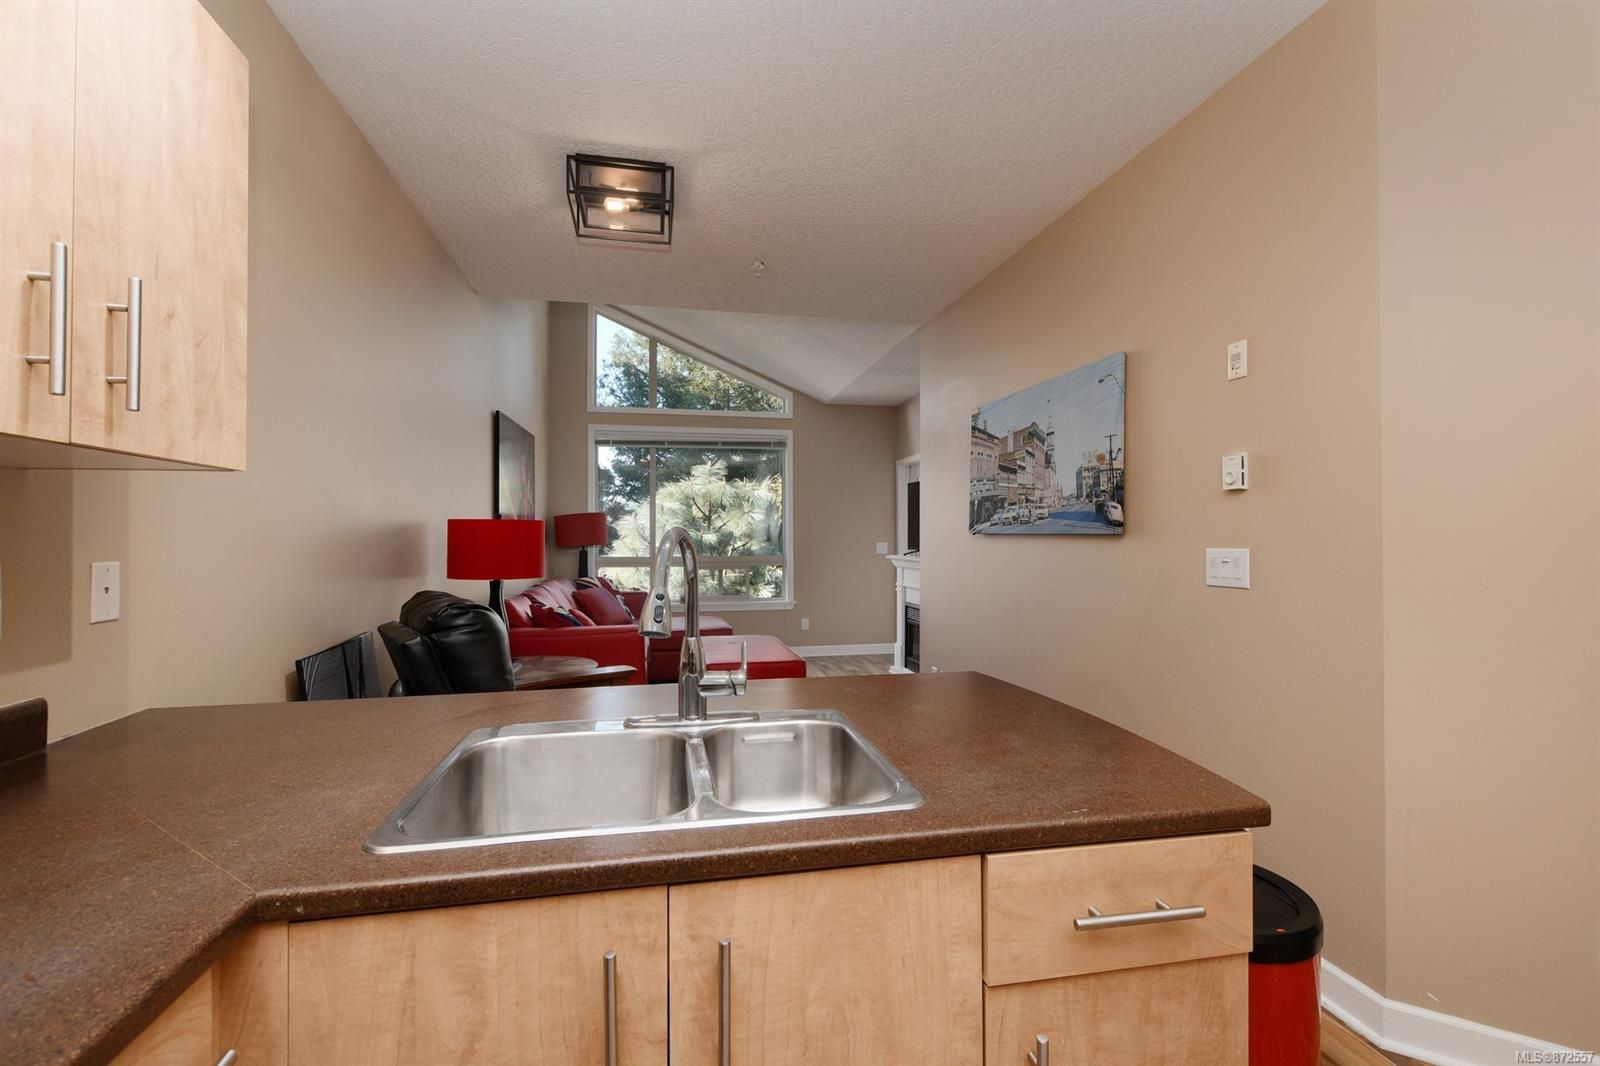 Photo 9: Photos: 411 825 Goldstream Ave in : La Langford Proper Condo for sale (Langford)  : MLS®# 872557